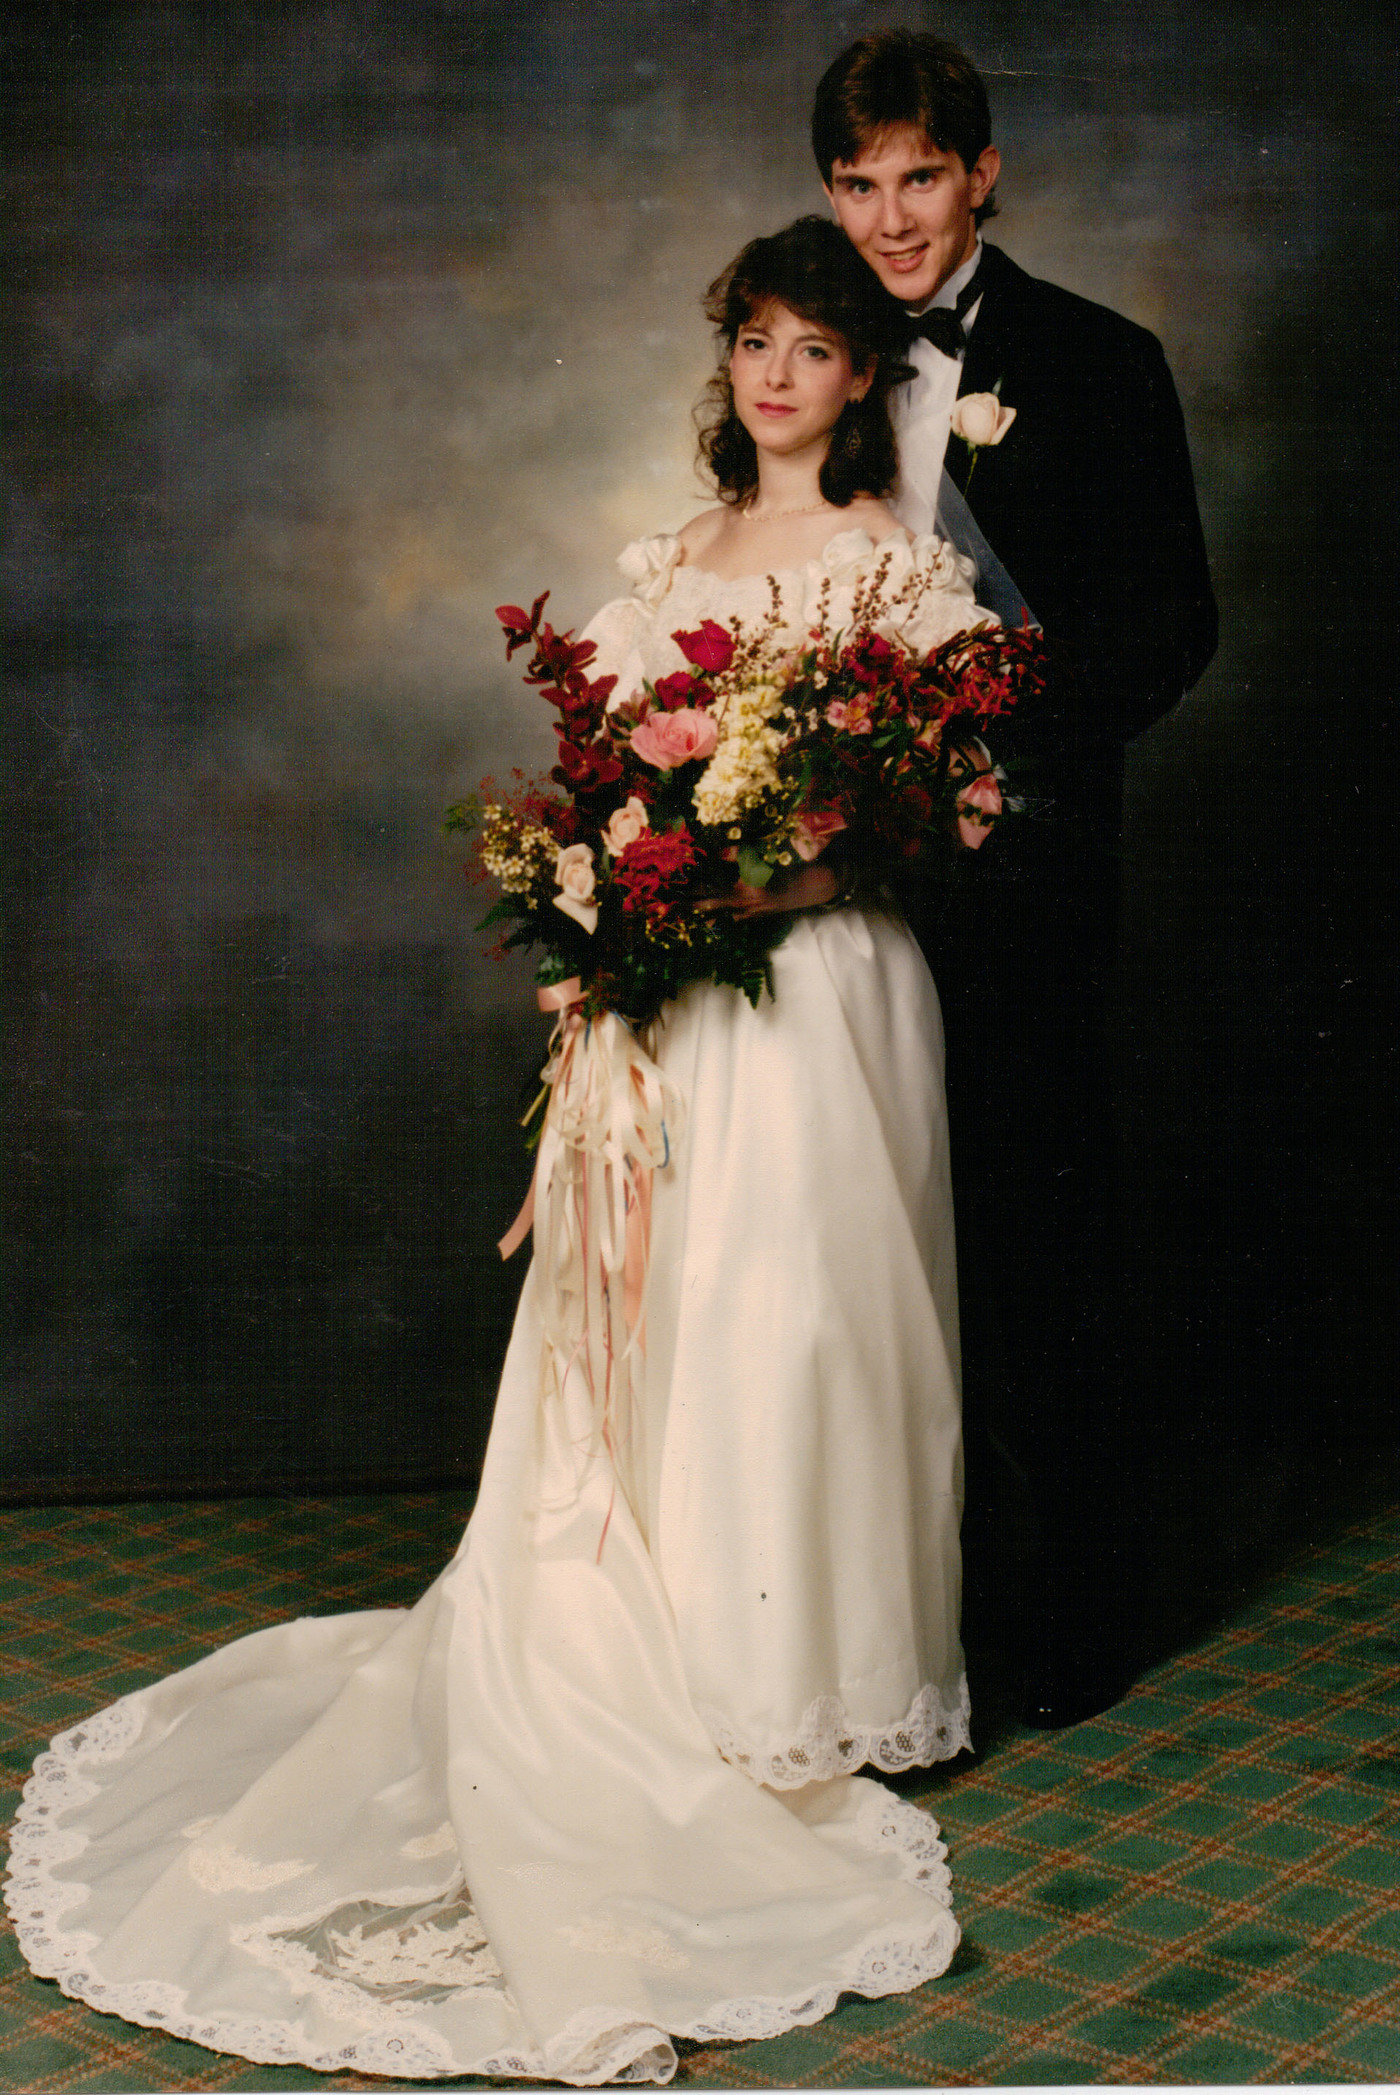 1990 Wedding By Debra Samitz At Coroflot Com